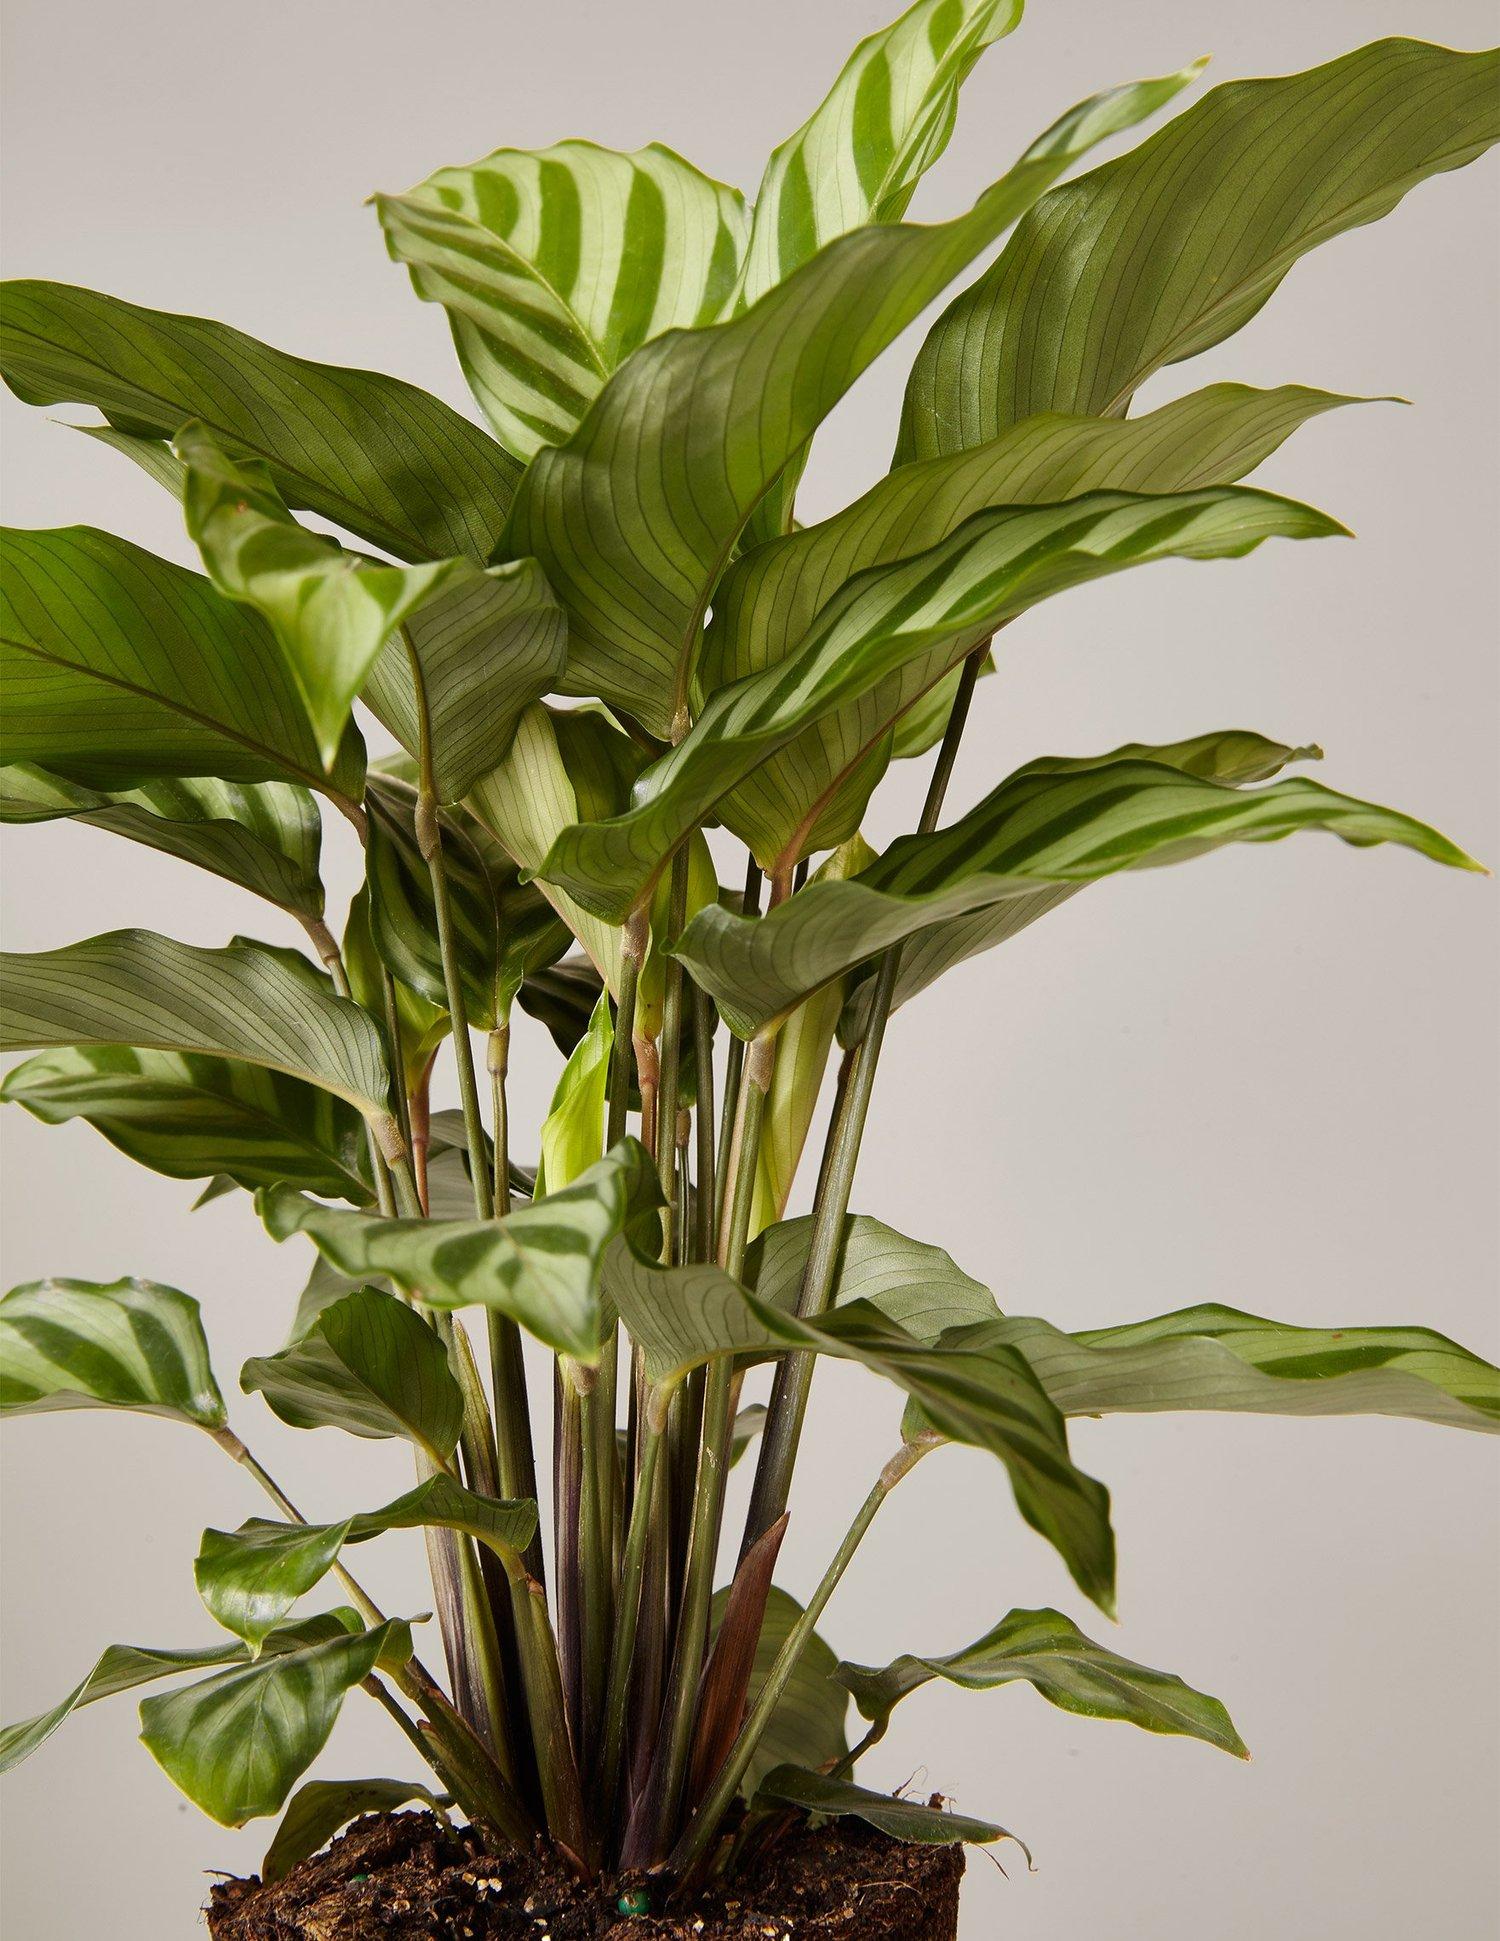 gallery_the-sill_calathea-plant-freddie_2_4_3ca3c9fe-6336-4b42-b4d3-c75910be72a1_1500x.progressive.jpg